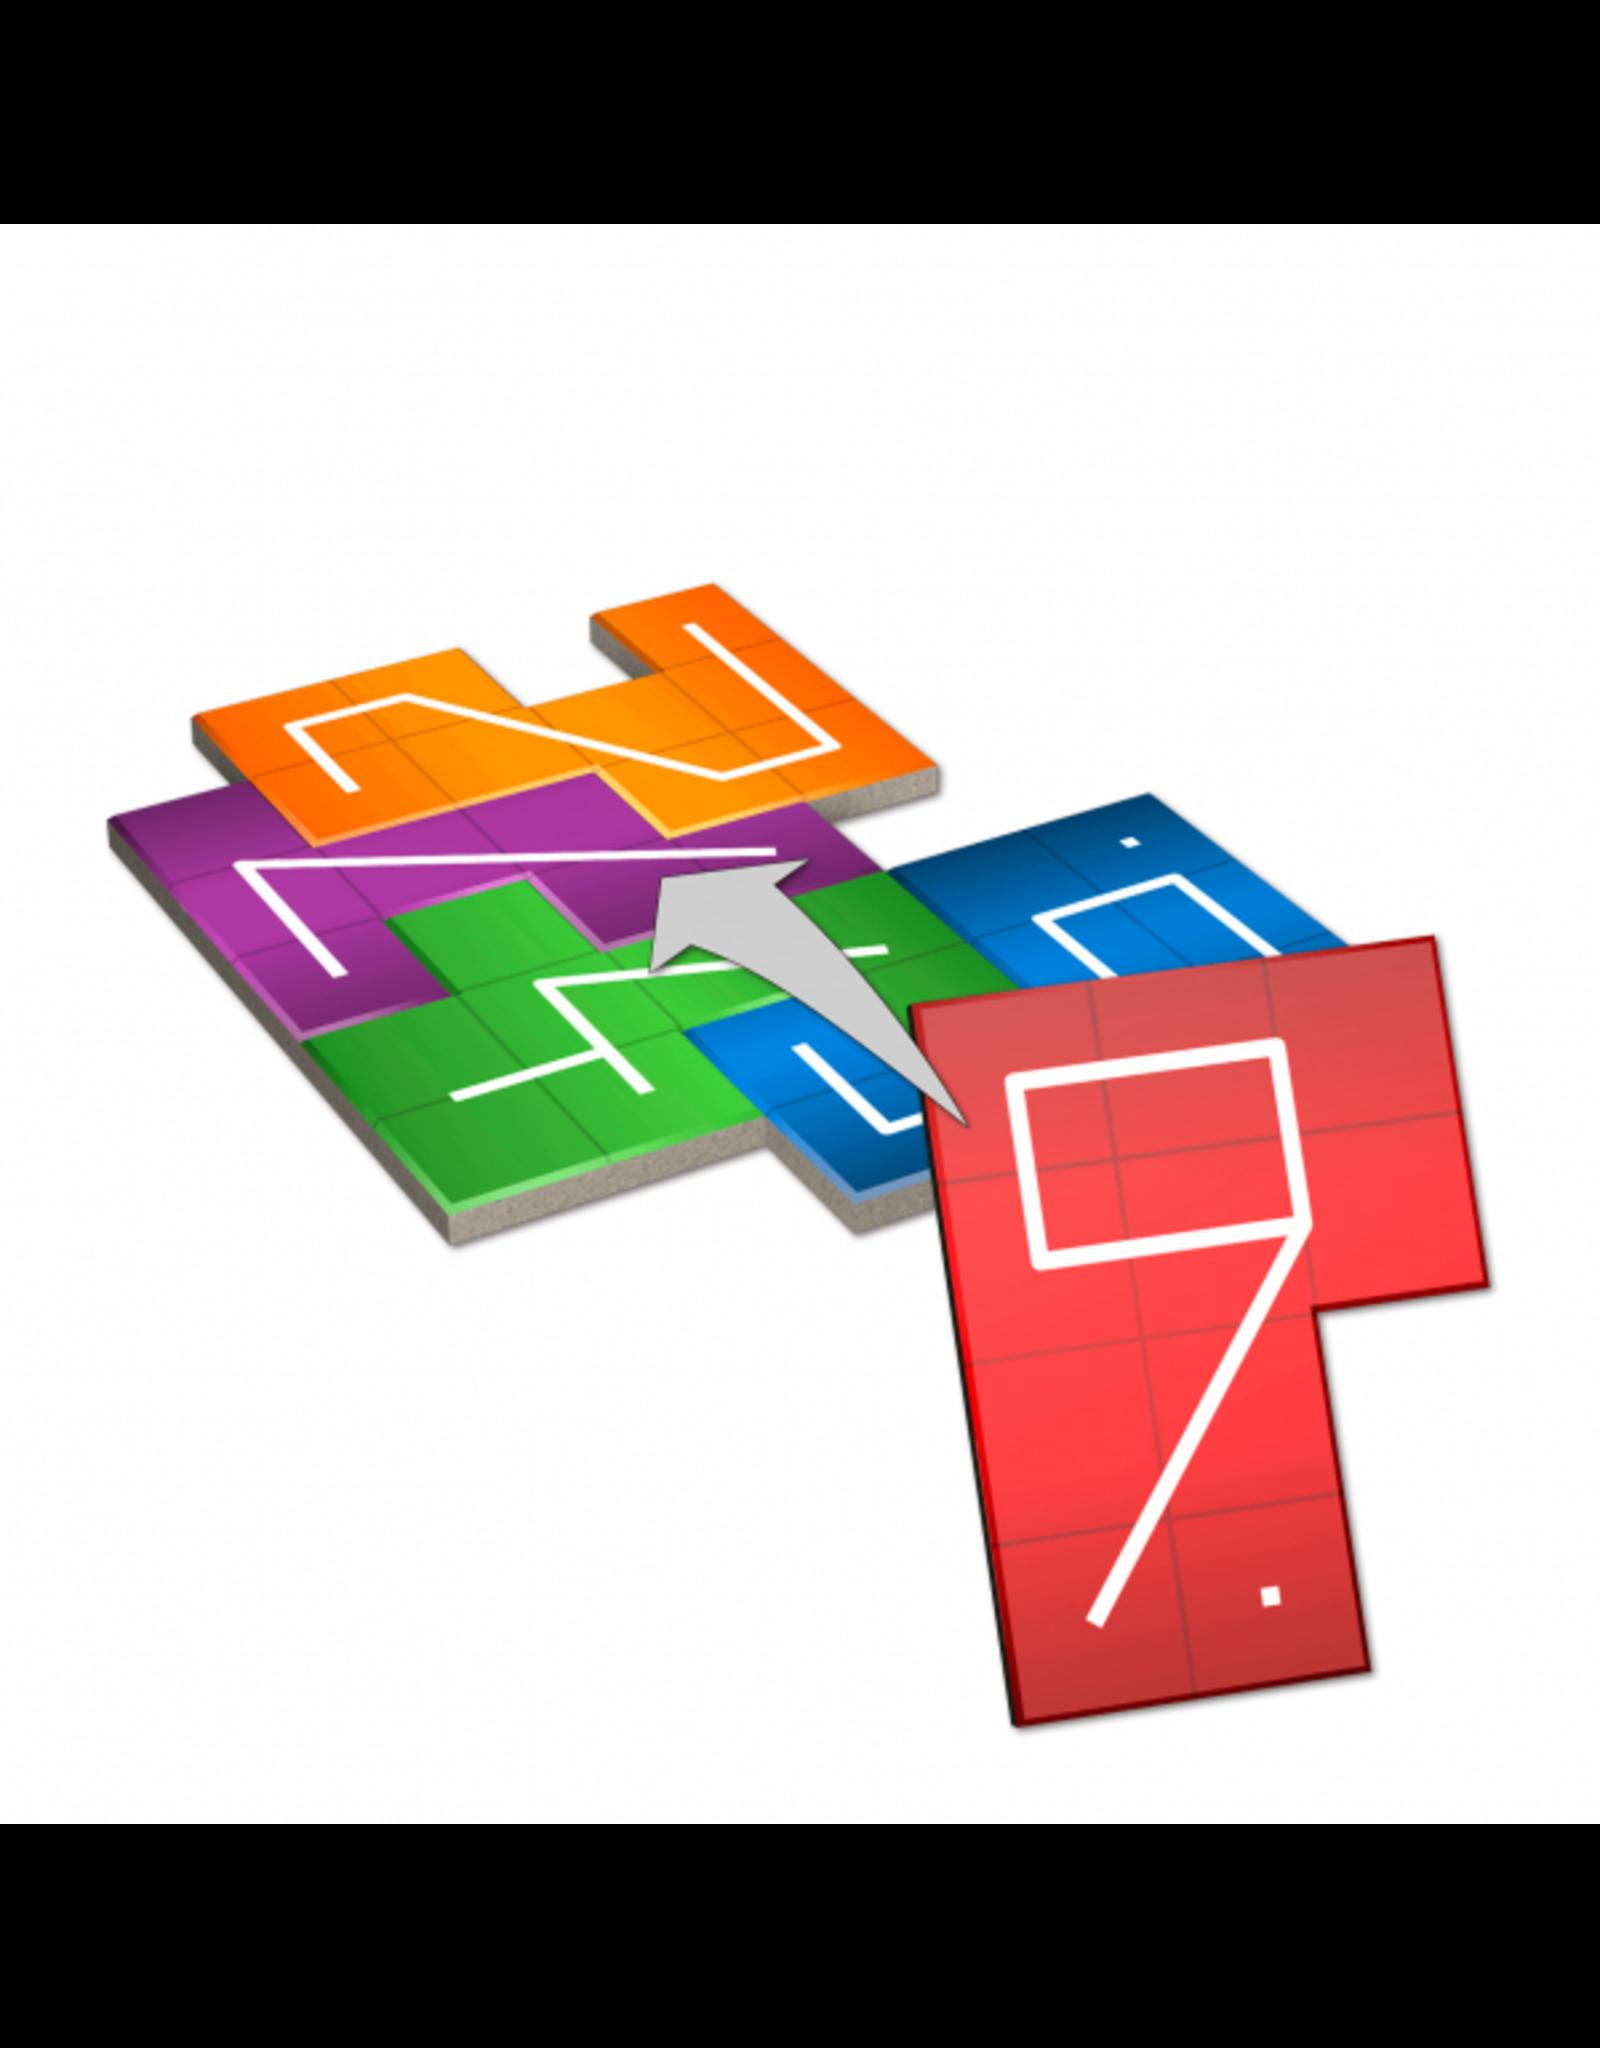 Z-Man Games NMBR 9